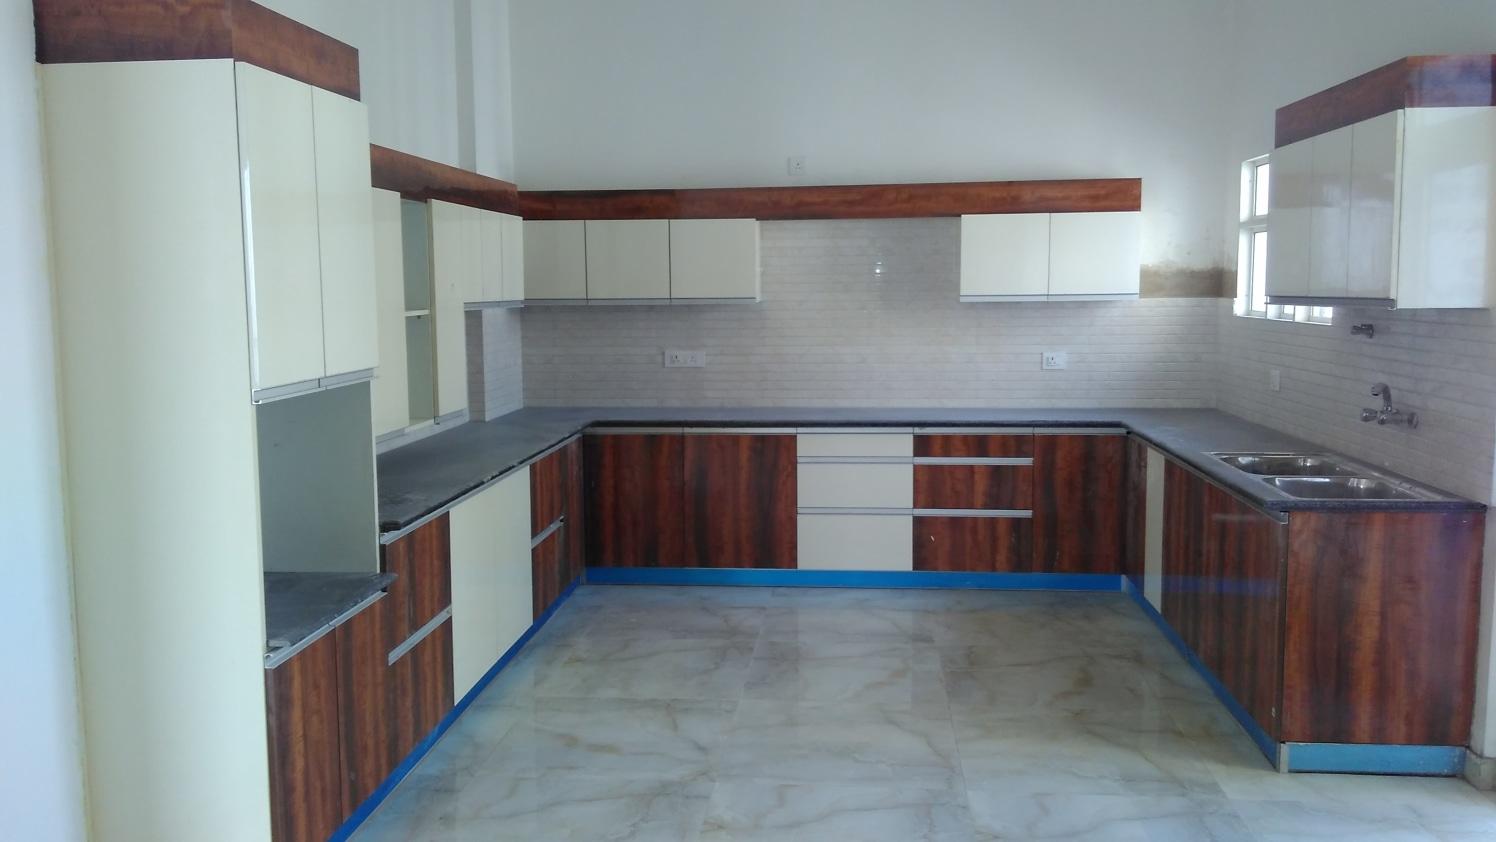 Modular Kitchen by Abhinav Gupta Modular-kitchen Modern | Interior Design Photos & Ideas